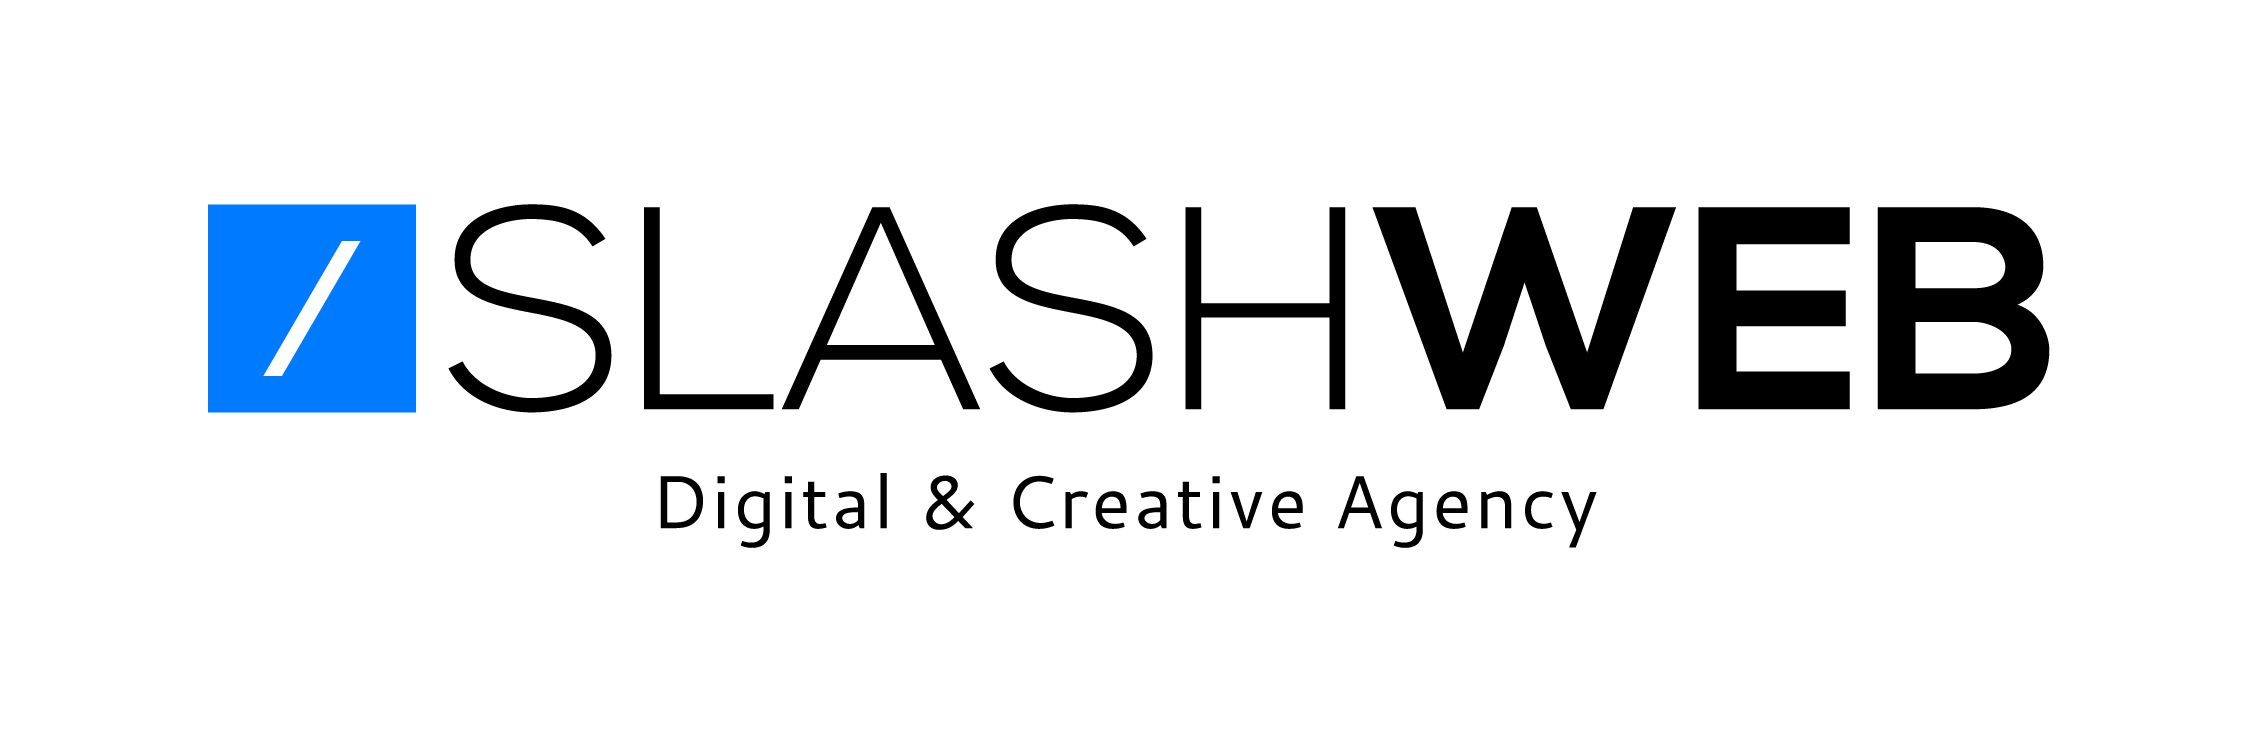 SlahWeb Horizontal + Assinatura (ver.Preto).png